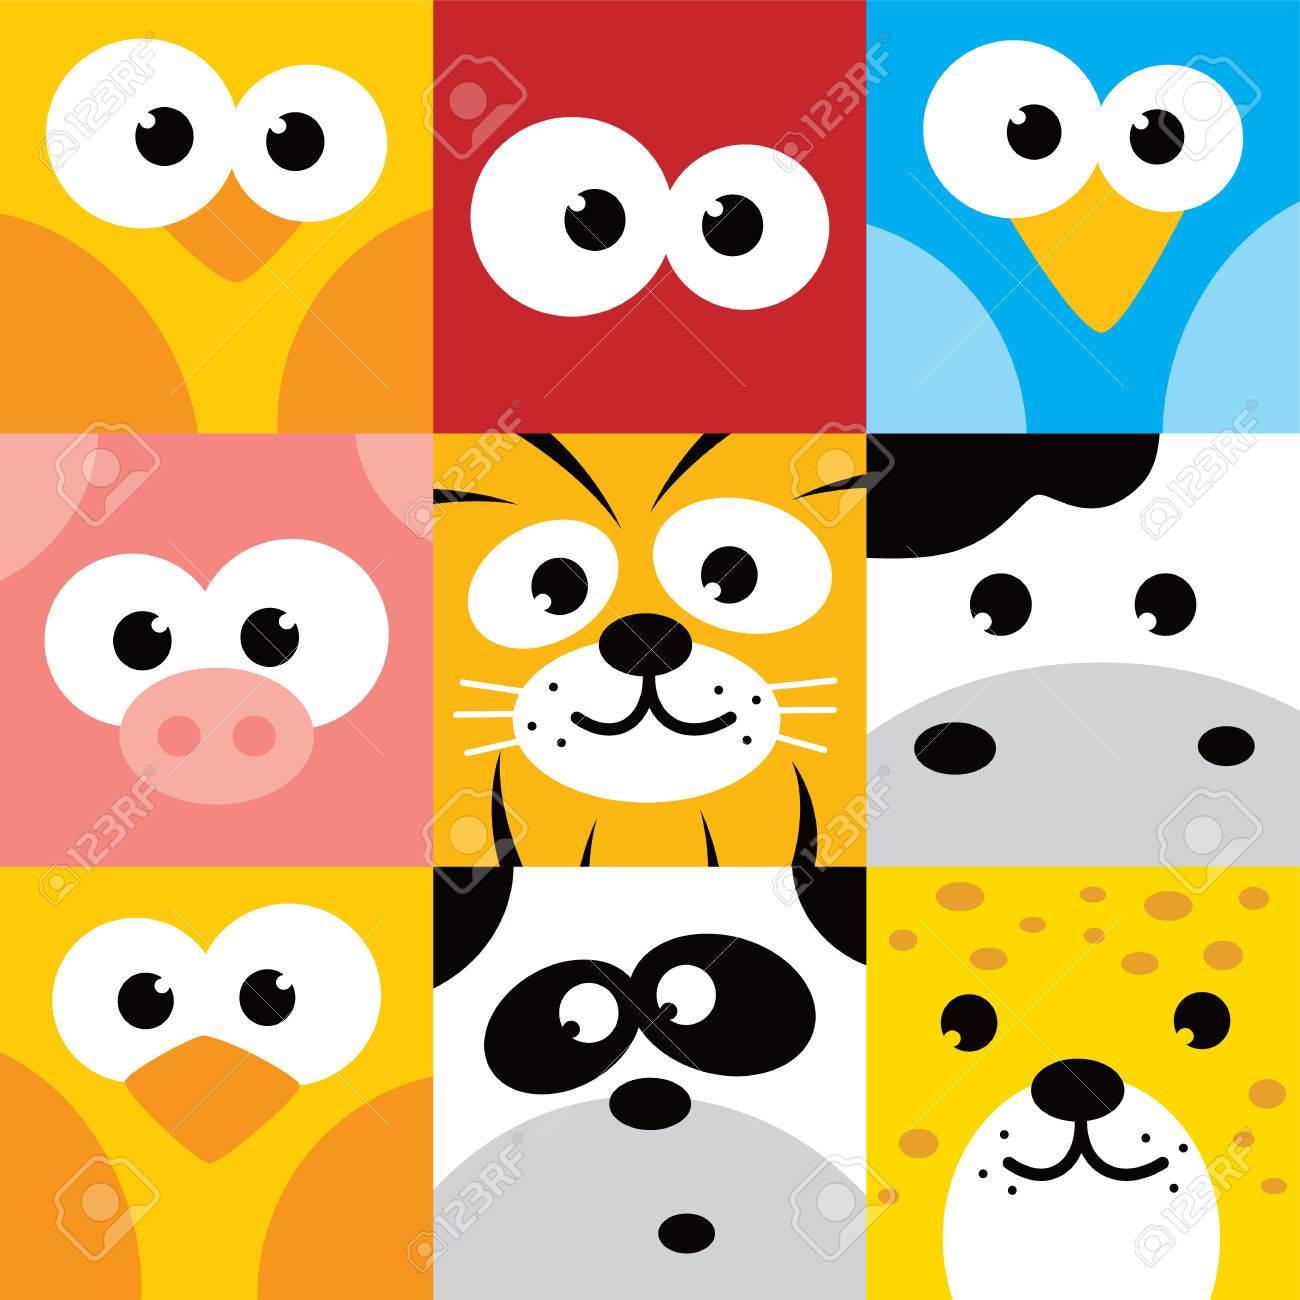 square animal face icon button set vector illustration - 54142522